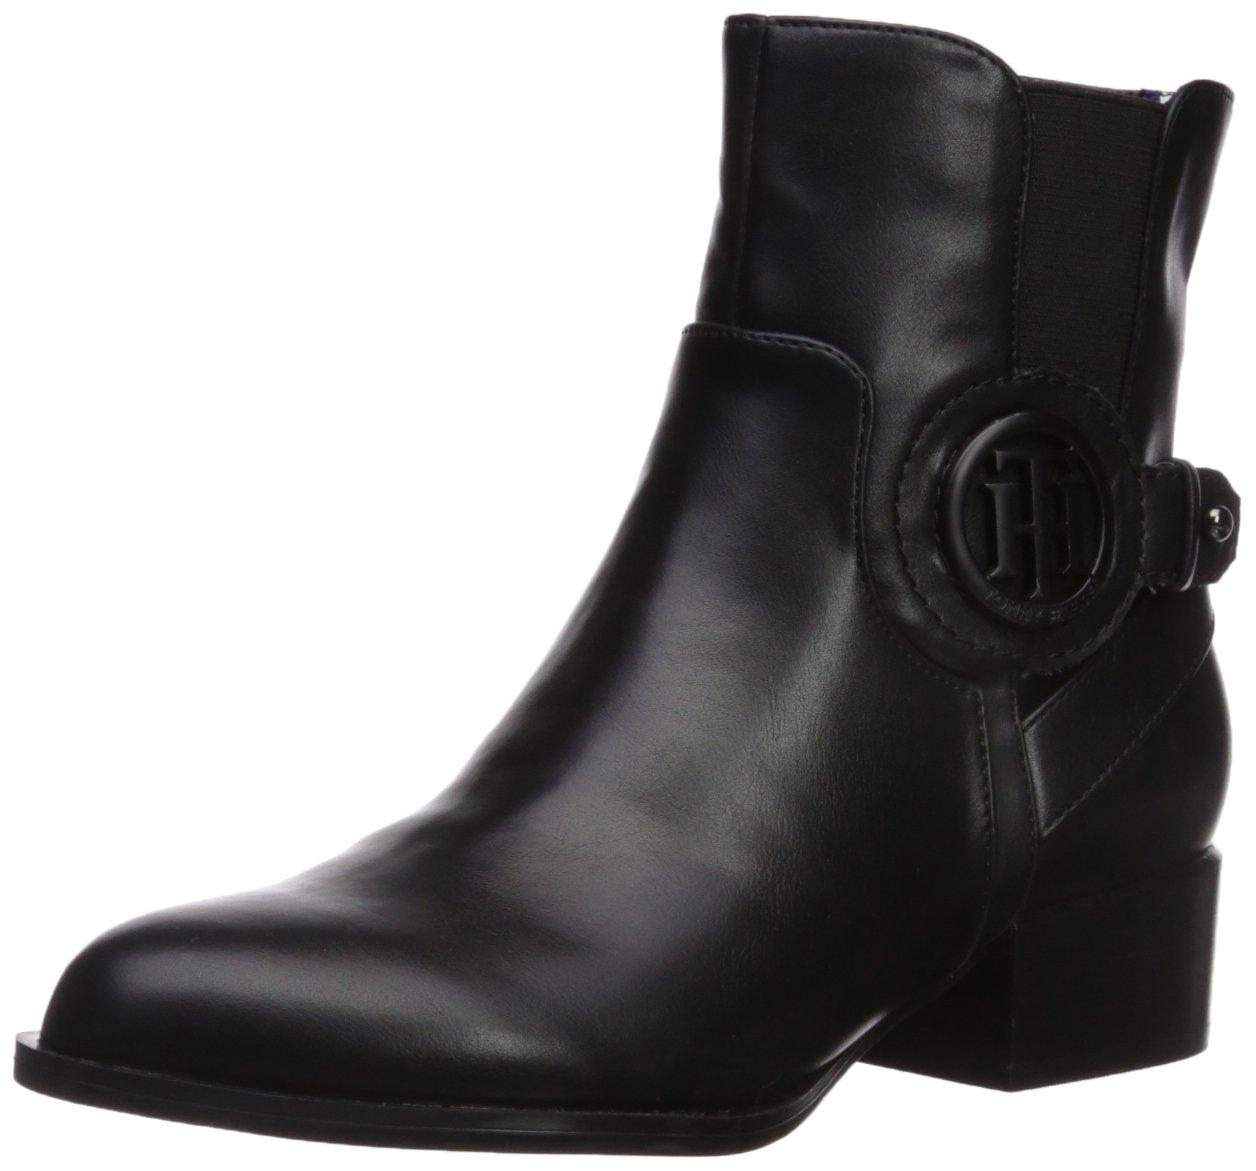 Tommy Hilfiger Women's Mavrick Ankle Boot B06XVJ9PYX 8.5 B(M) US|Black